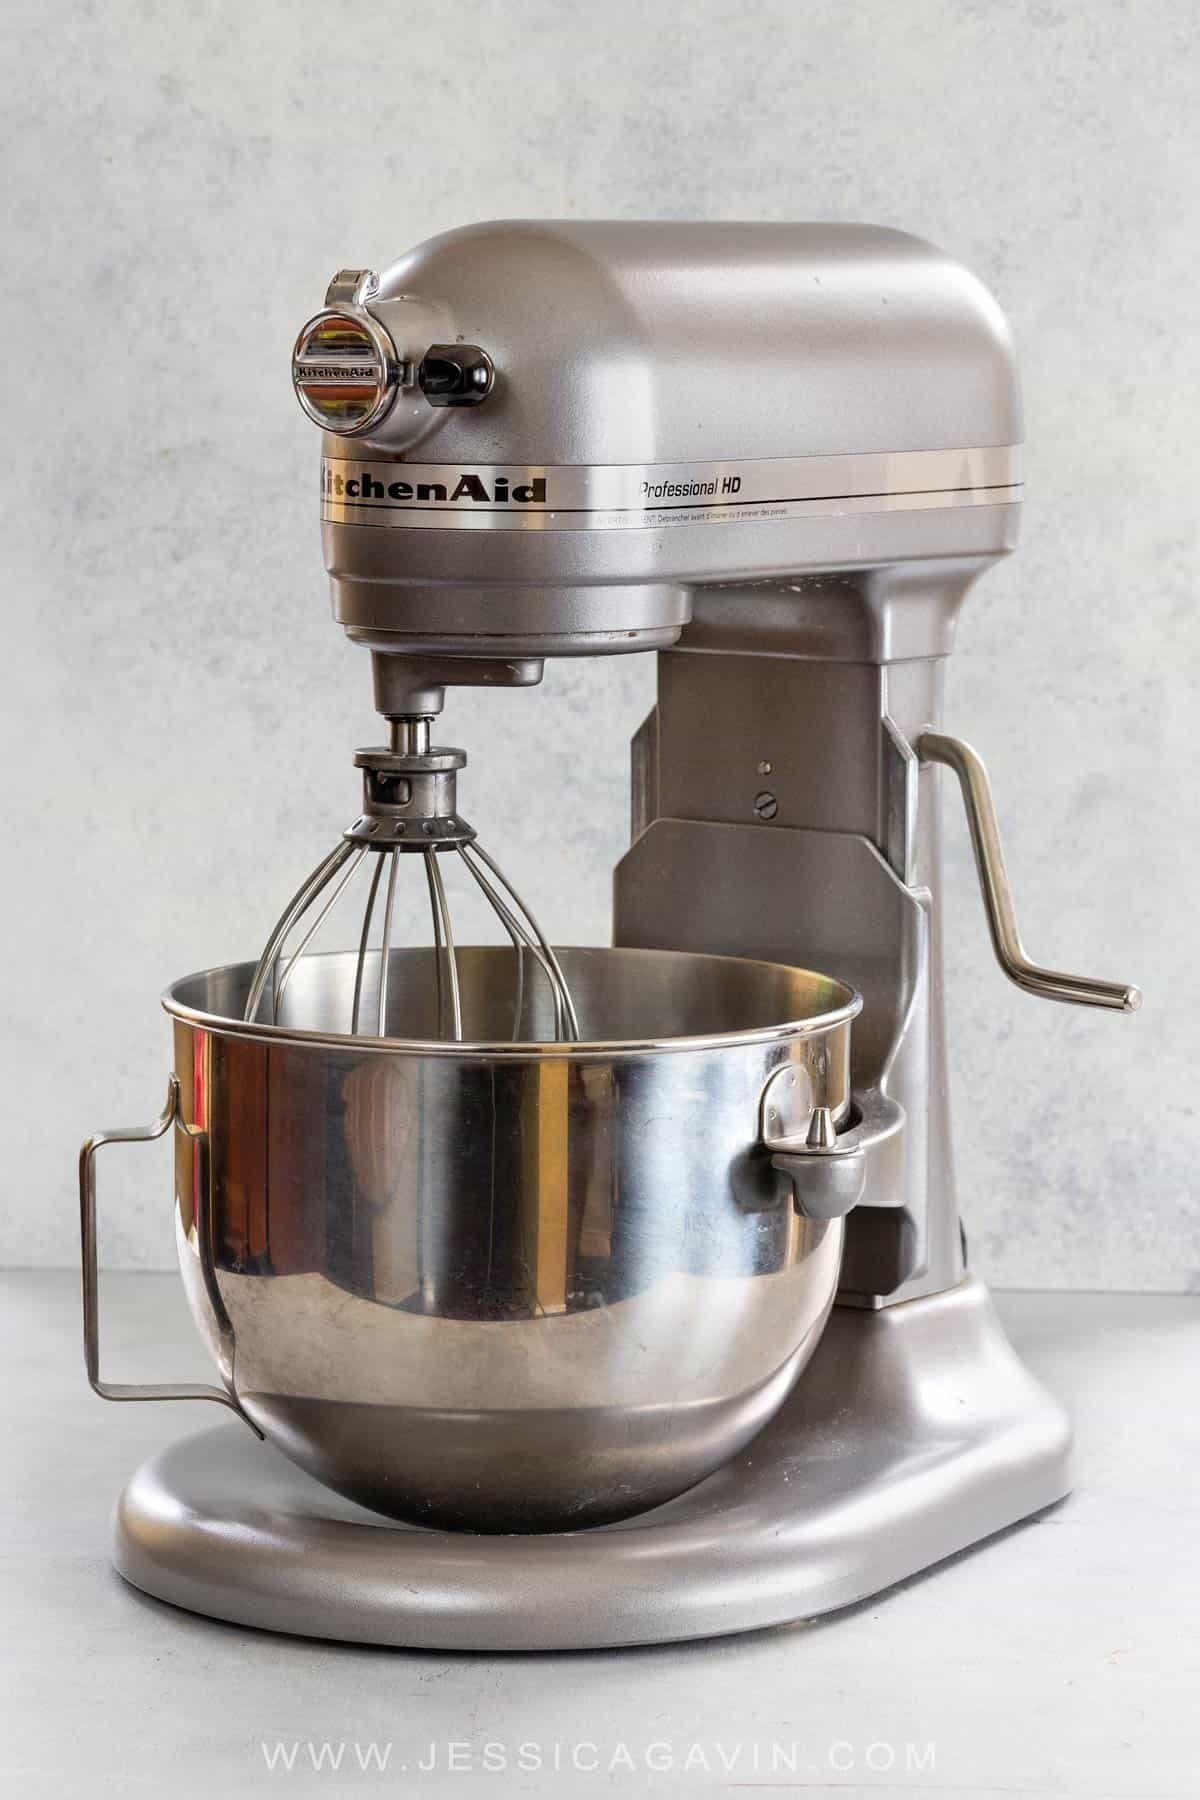 Stand Mixer Guide Kitchen Aid Kitchen Countertop Appliances